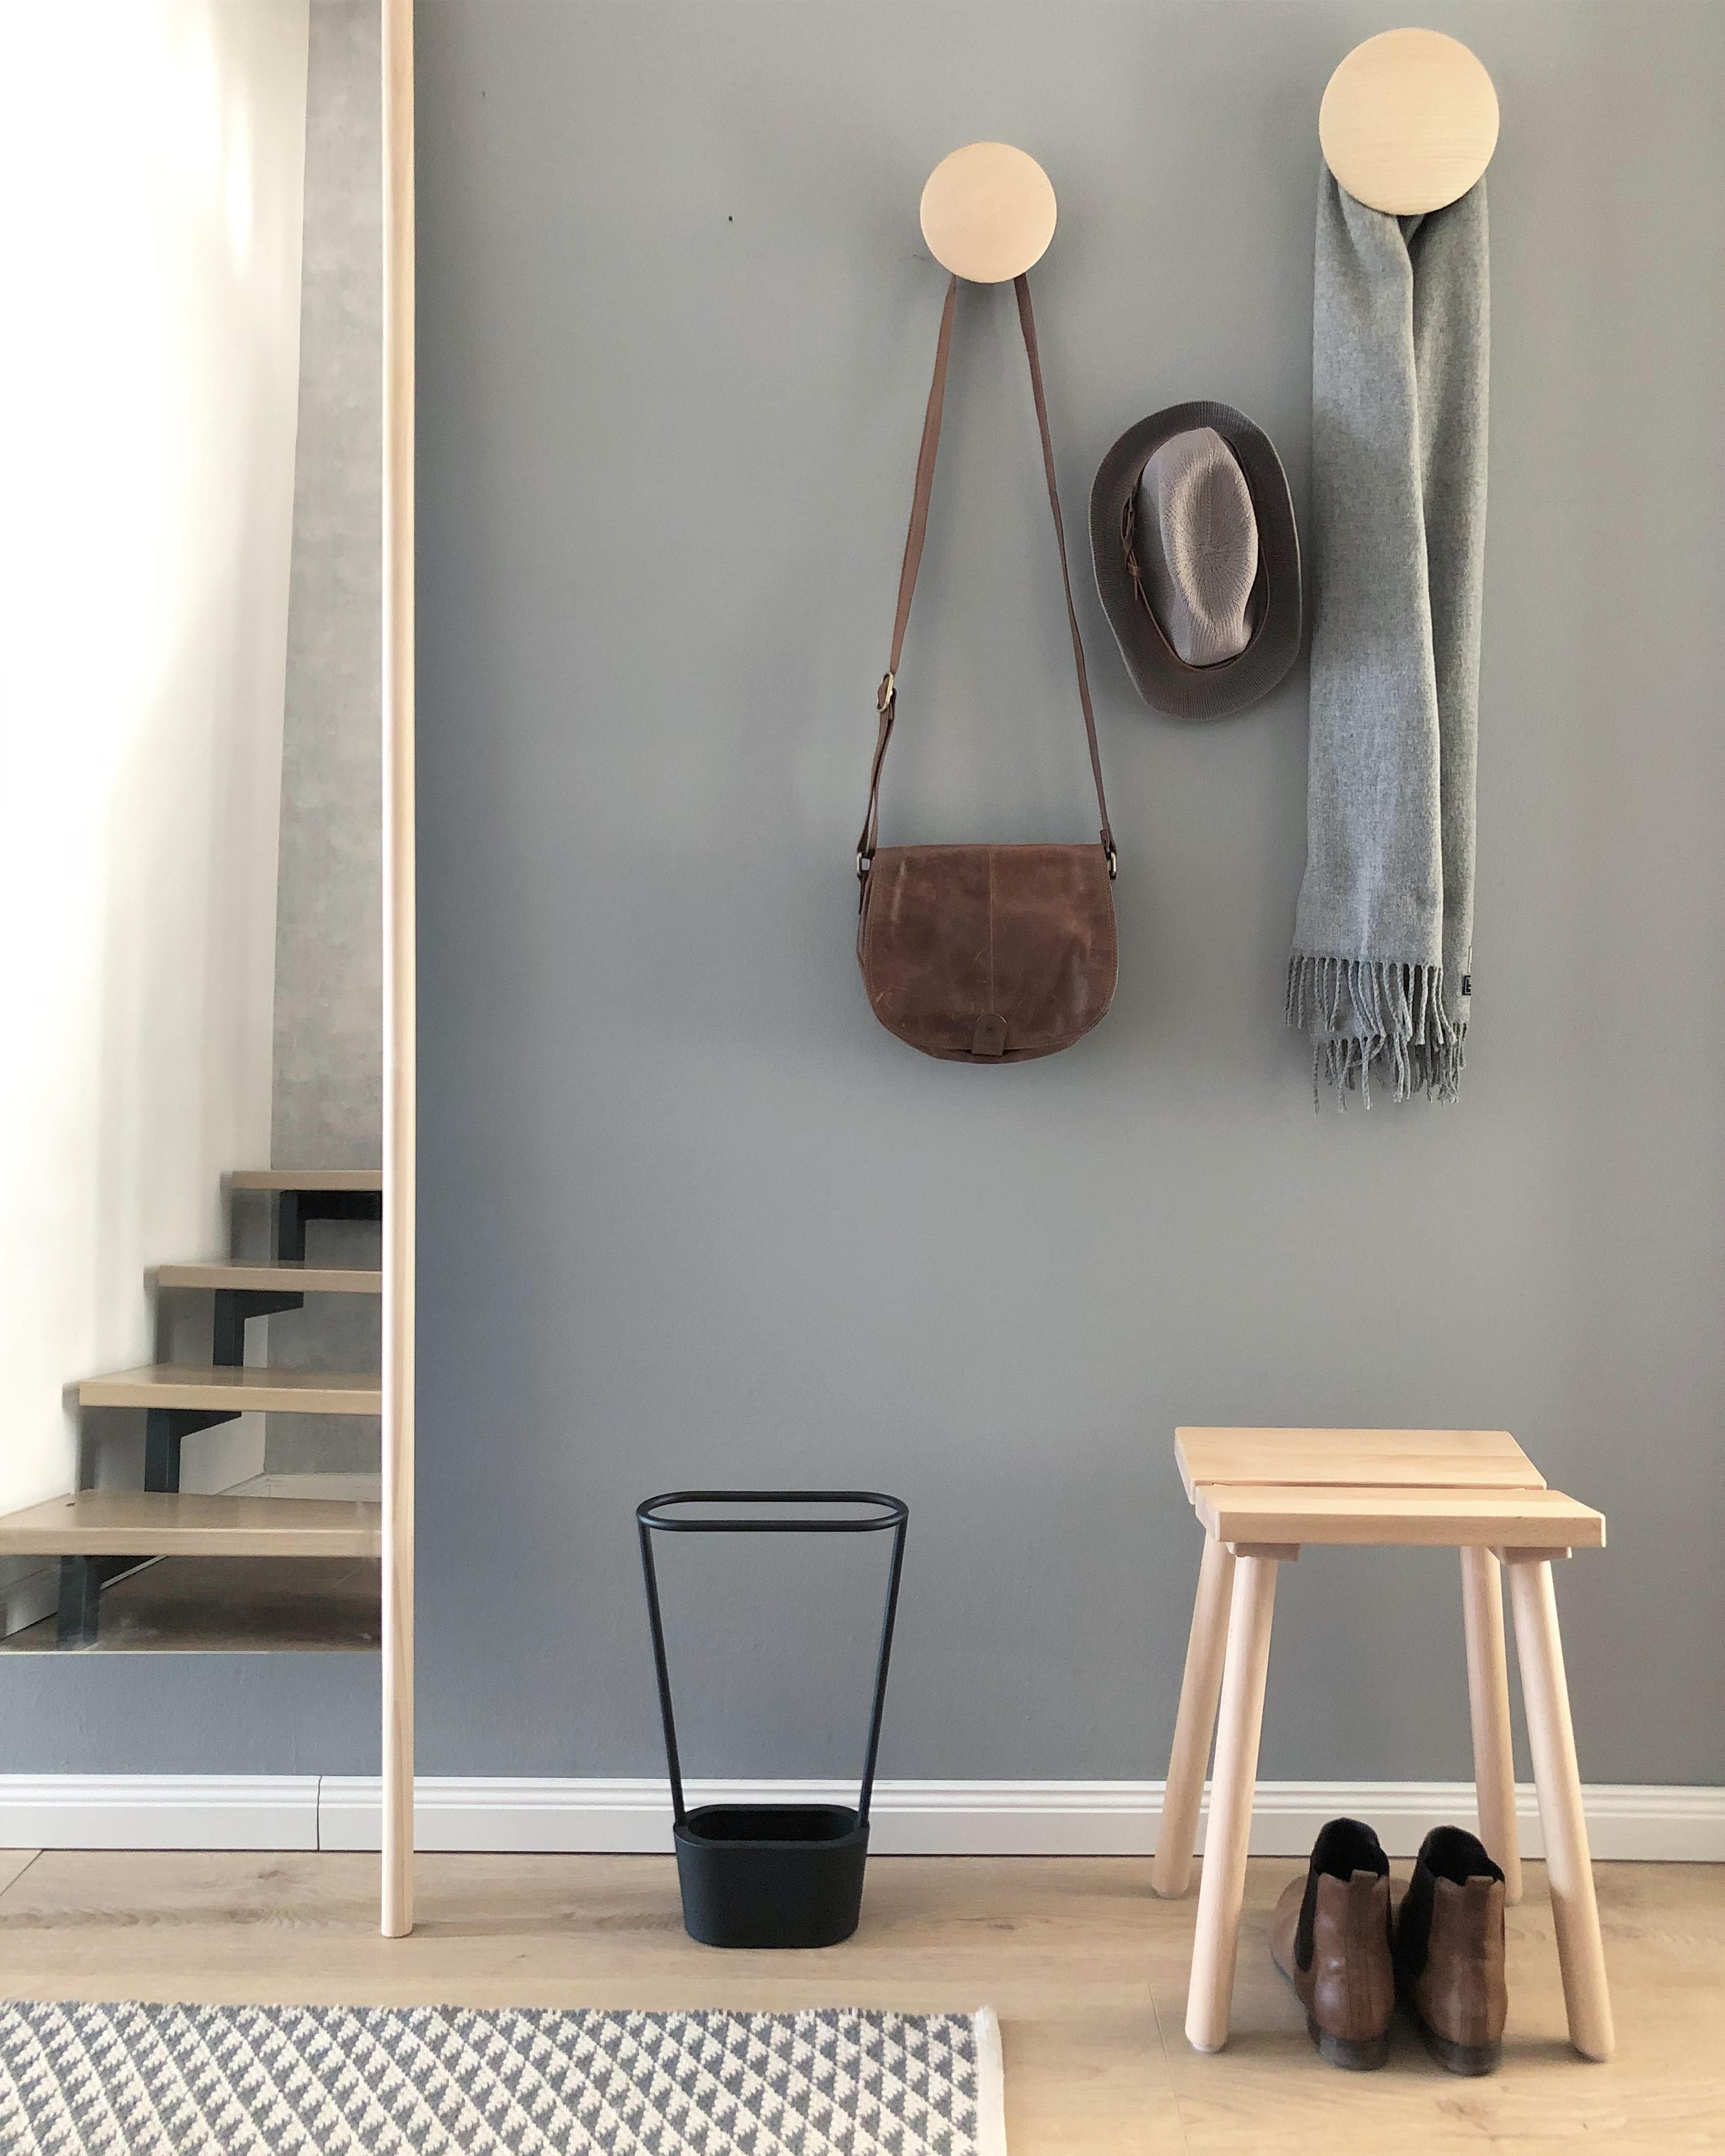 Garderobeninspo Garderobe Flur Diele Garderobe Diele Flur Flurfarbe Garderobe Garderobe In 2020 Hallway Decorating Scandinavian Interior Style Interior